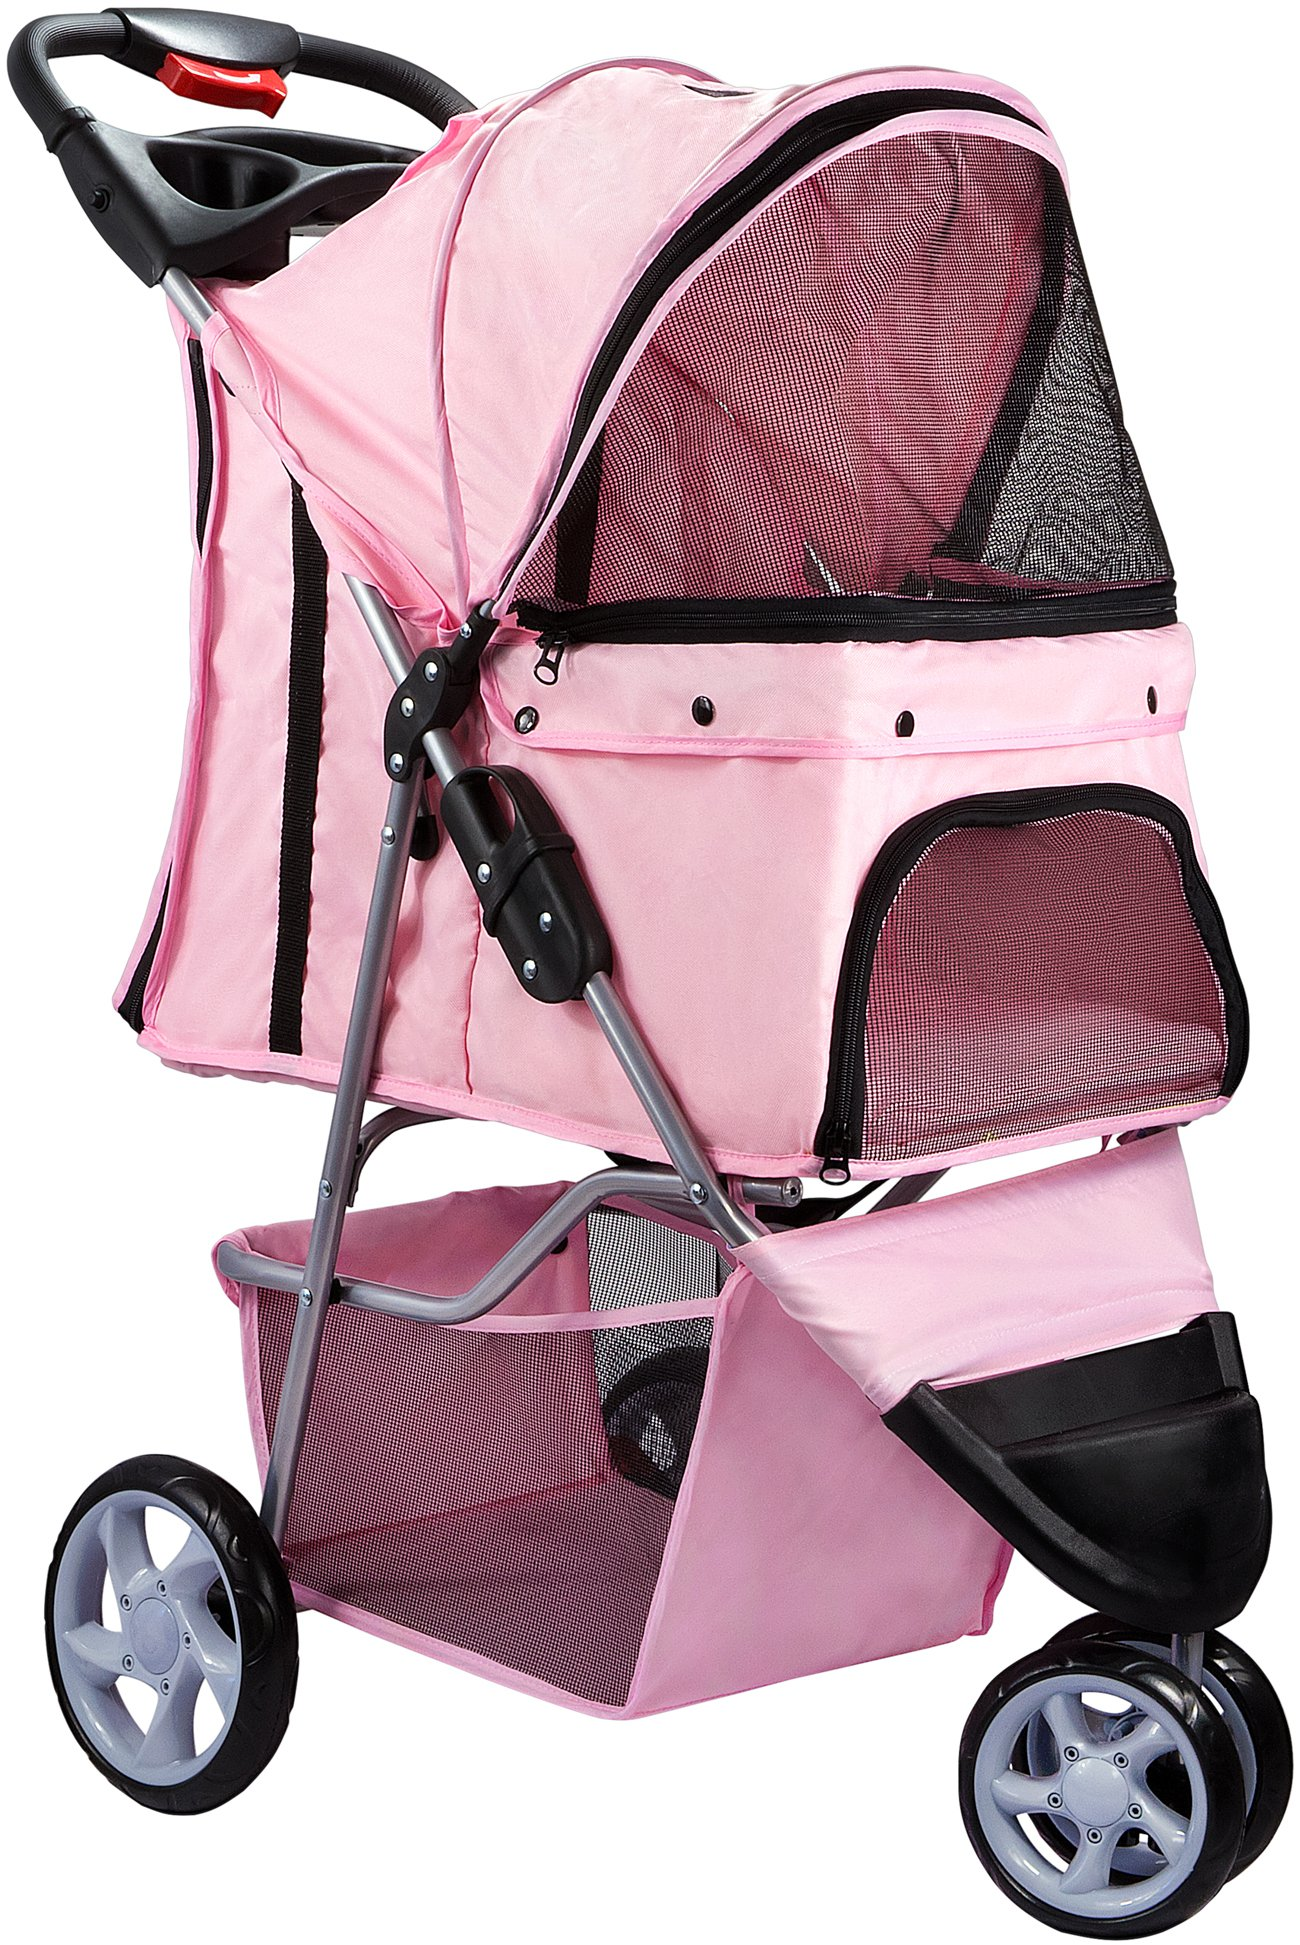 Paws & Pals OxGord 3 Wheeler Elite Jogger Pet Stroller Cat/Dog Easy Walk Folding Travel Carrier, Rose Wine